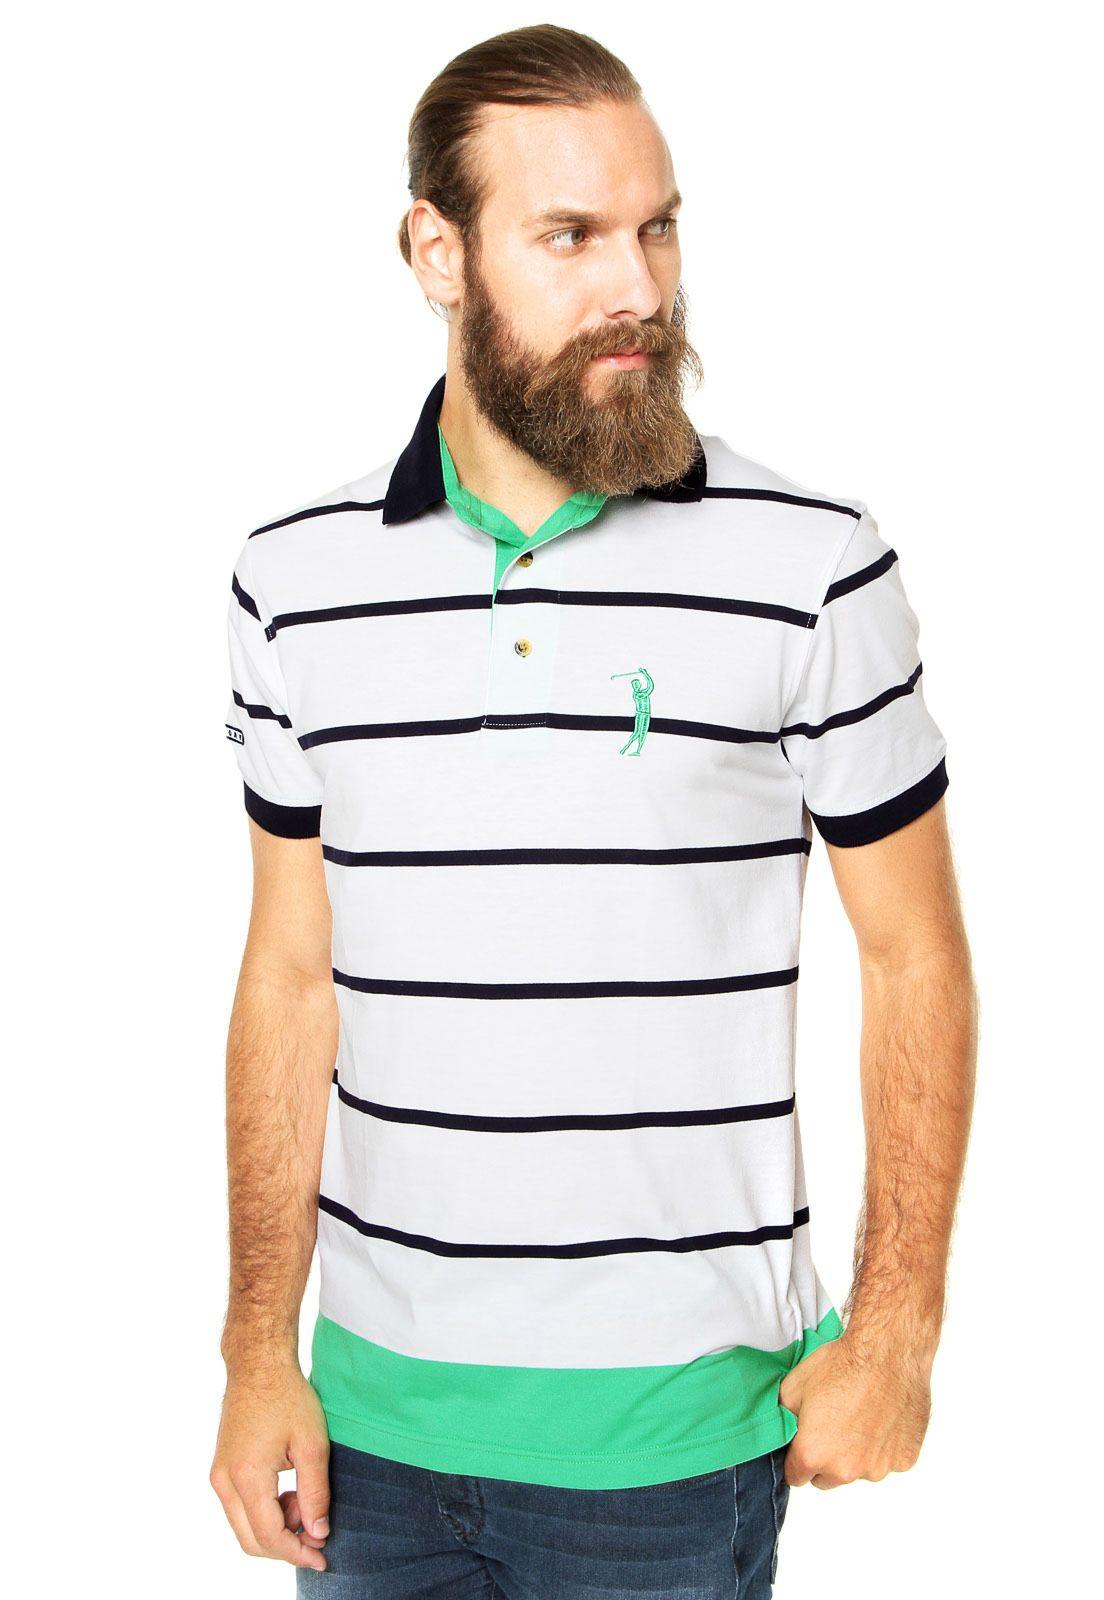 Camisa Polo Aleatory Listras Multicolorida - Marca Aleatory 4f7a65311eace